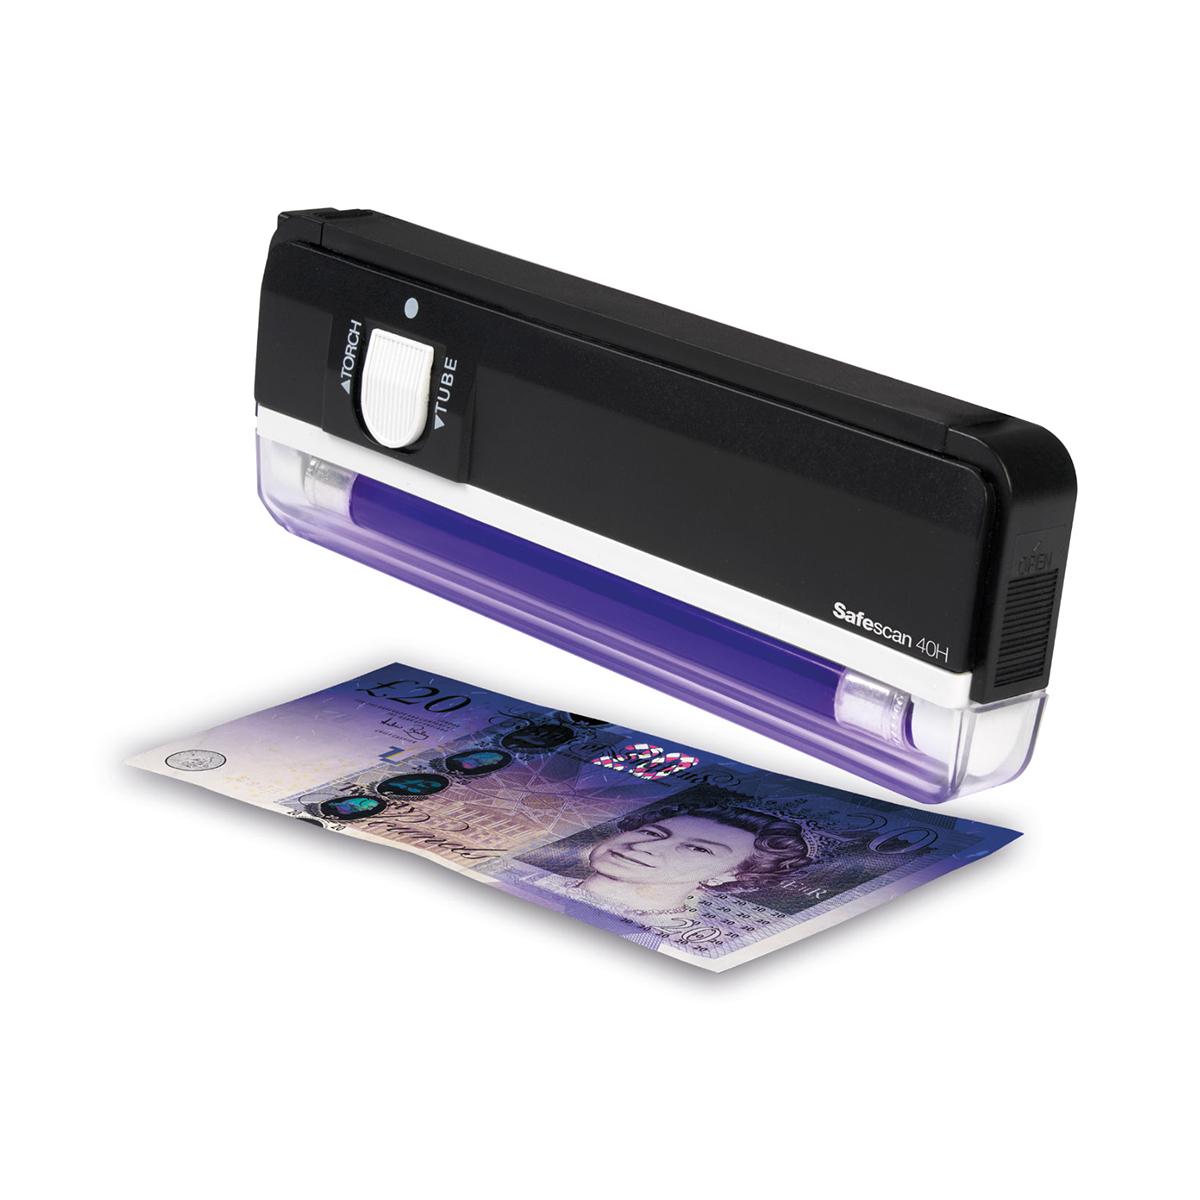 Safescan 40H Handheld UV Counterfeit Detector